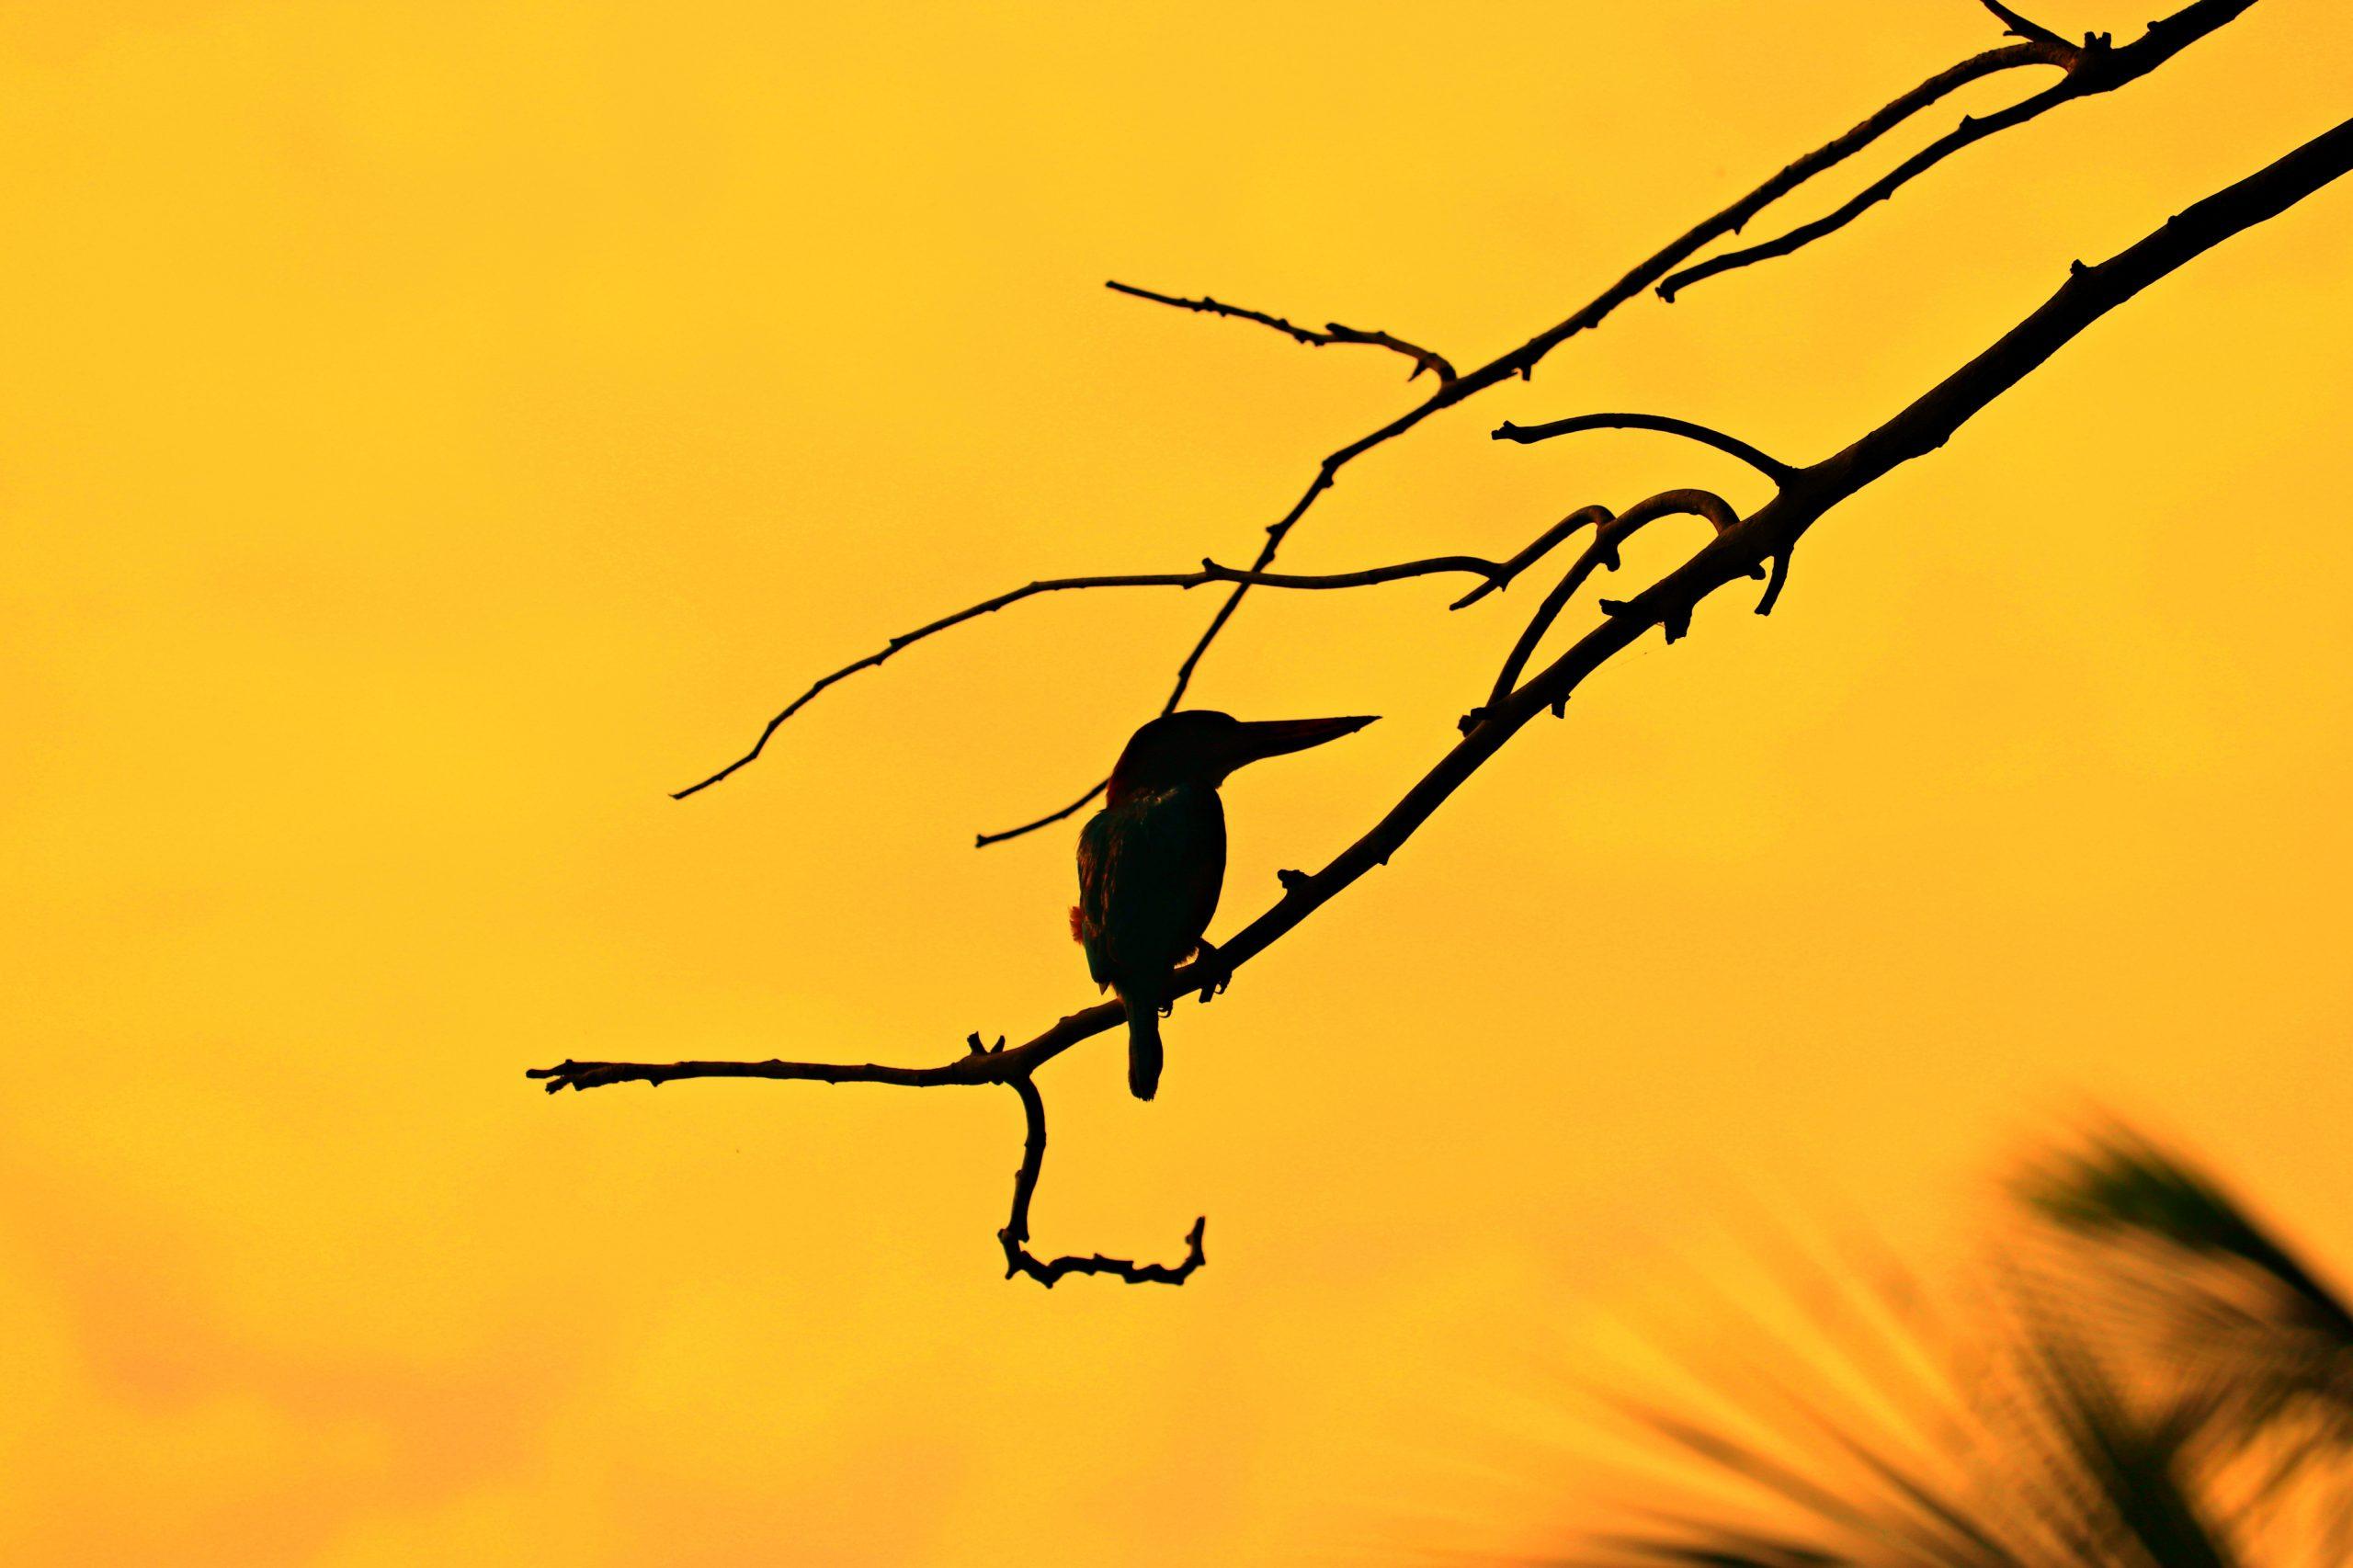 Kingfisher Bird on tree branch